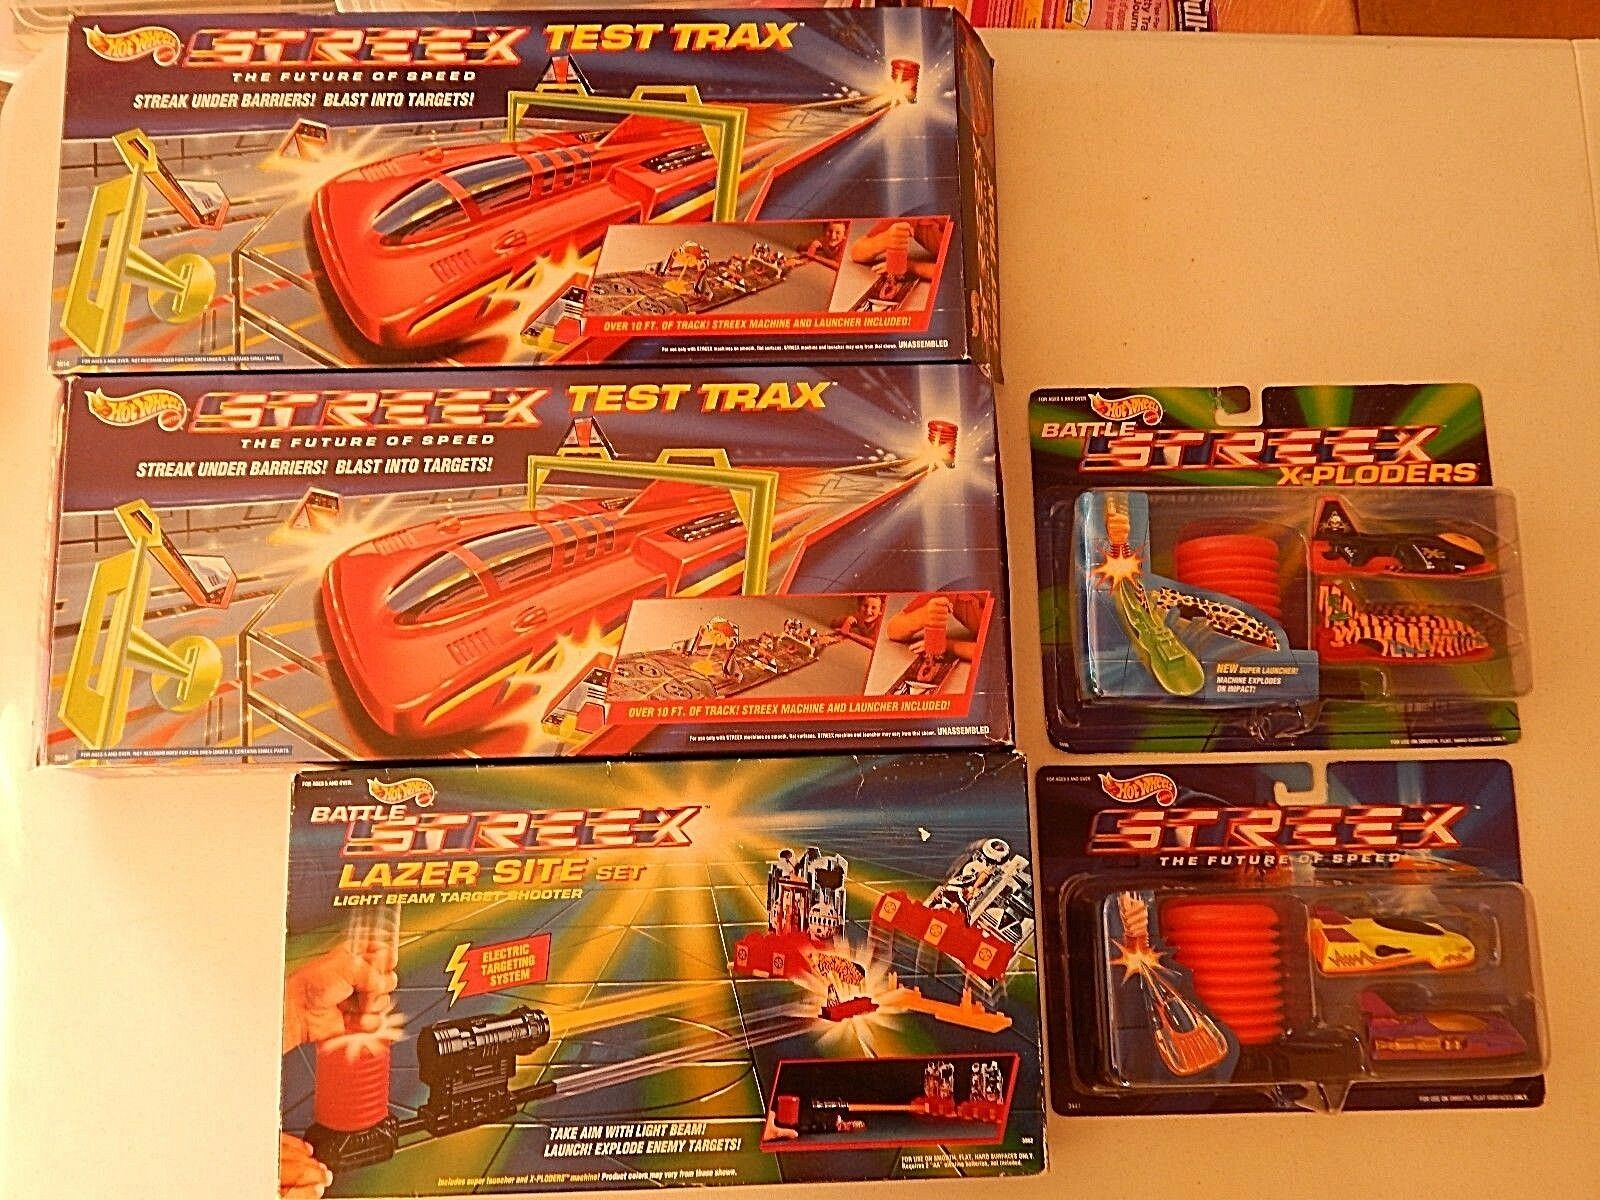 Hot Wheels Battle Streex Lazer sitio Set y prueba Trax Lote 1991 y 1992